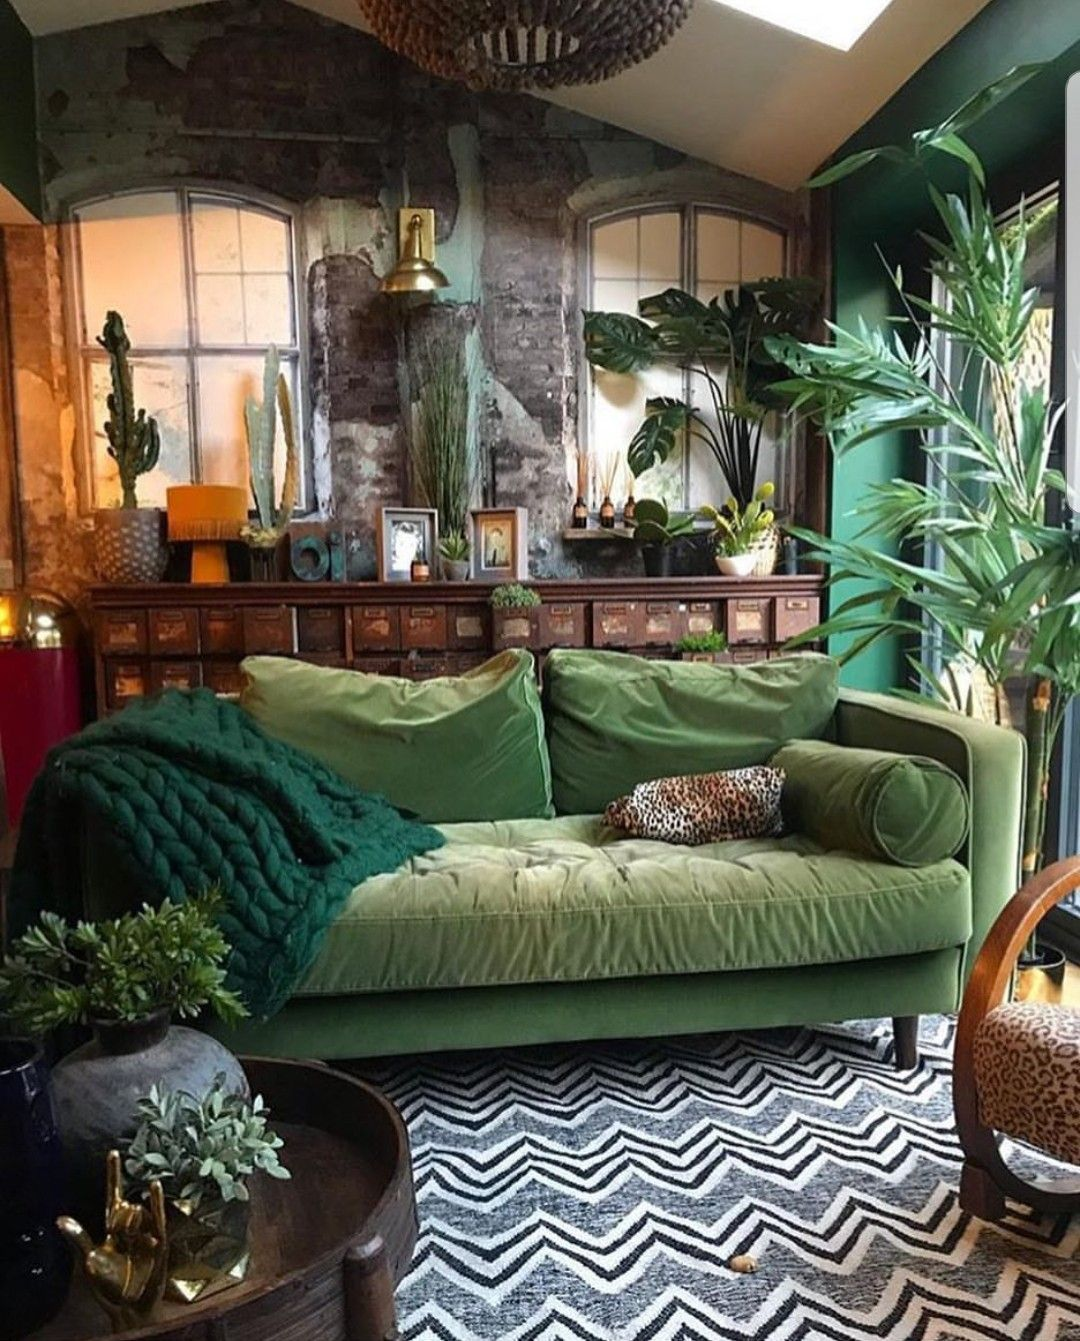 Boho living room #havenlylivingroom Boho living room #havenlylivingroom